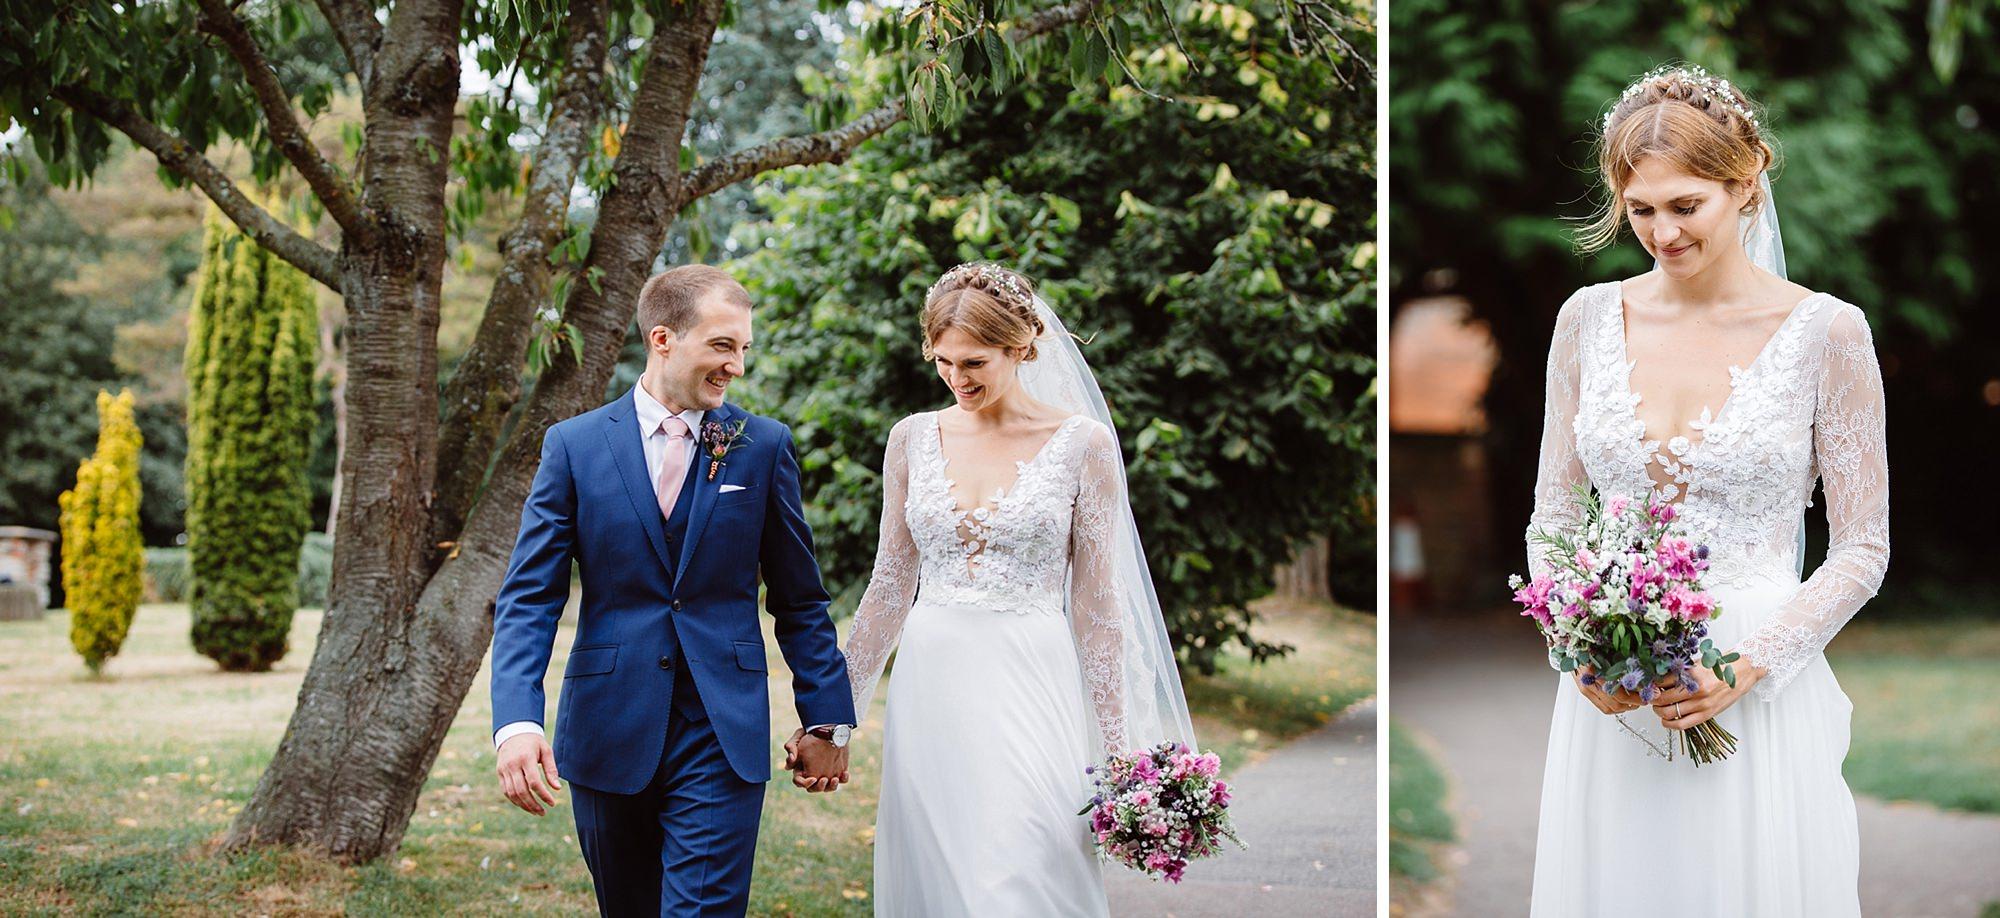 Marks Hall Estate wedding photography portrait of bride